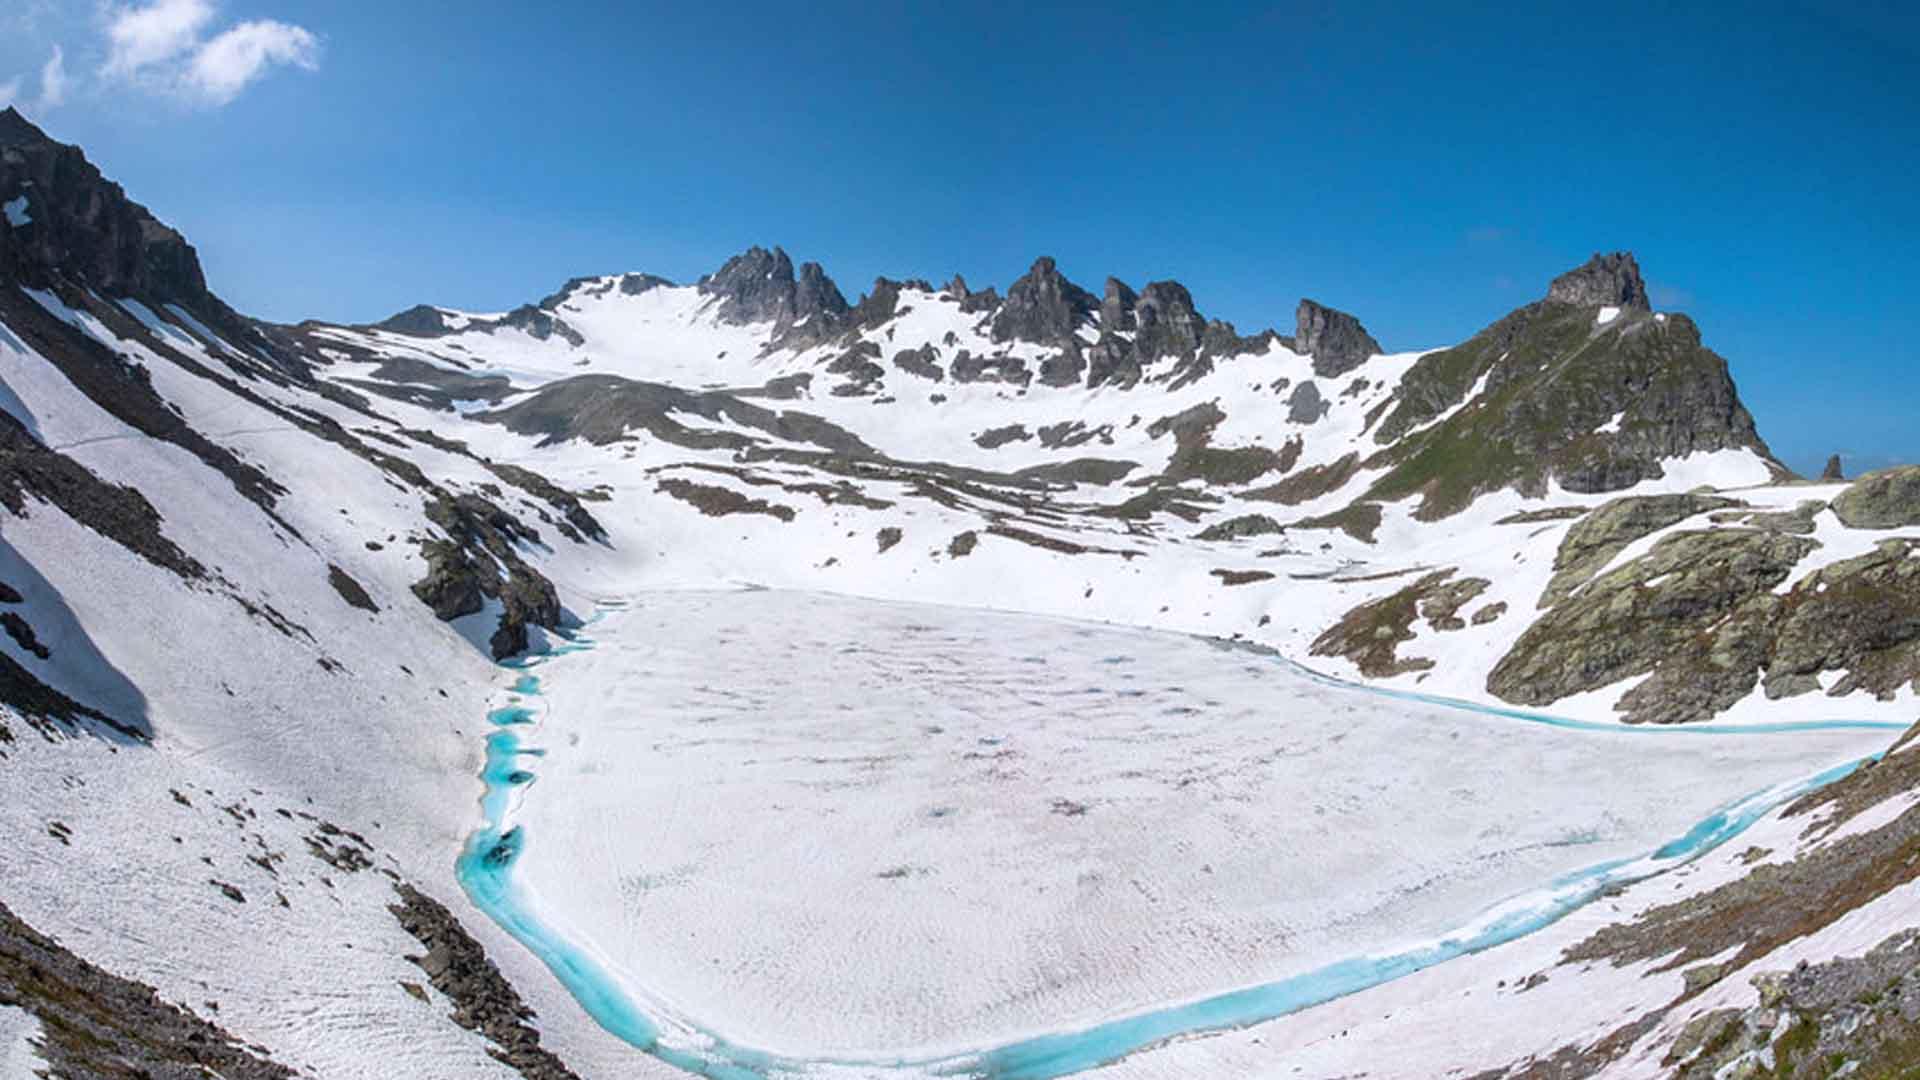 Il ghiacciaio Pizol